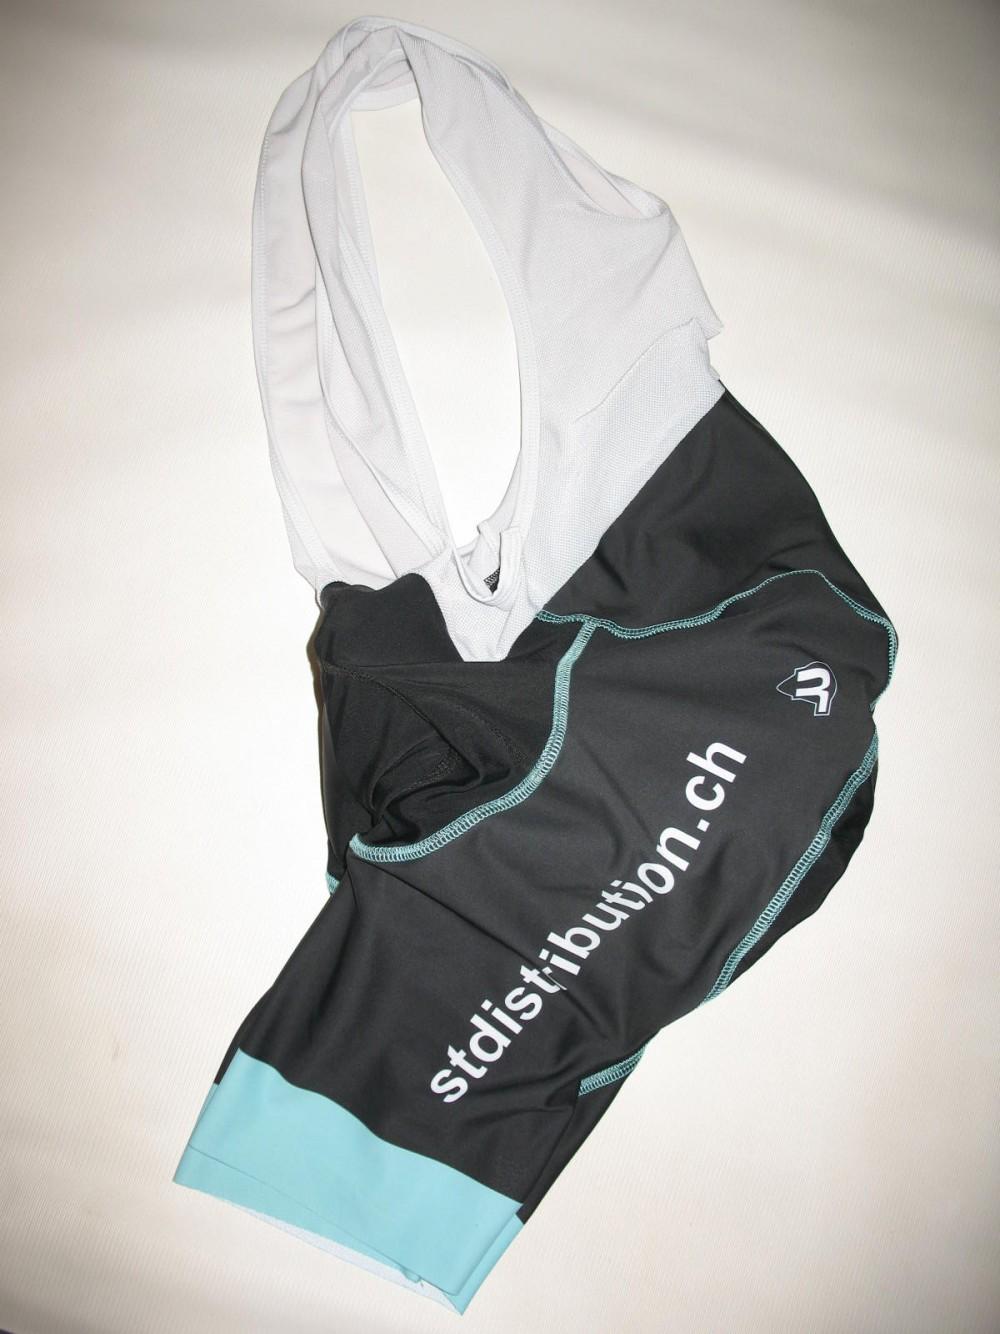 Велошорты VIFRA bib cycling shorts (размер М) - 3